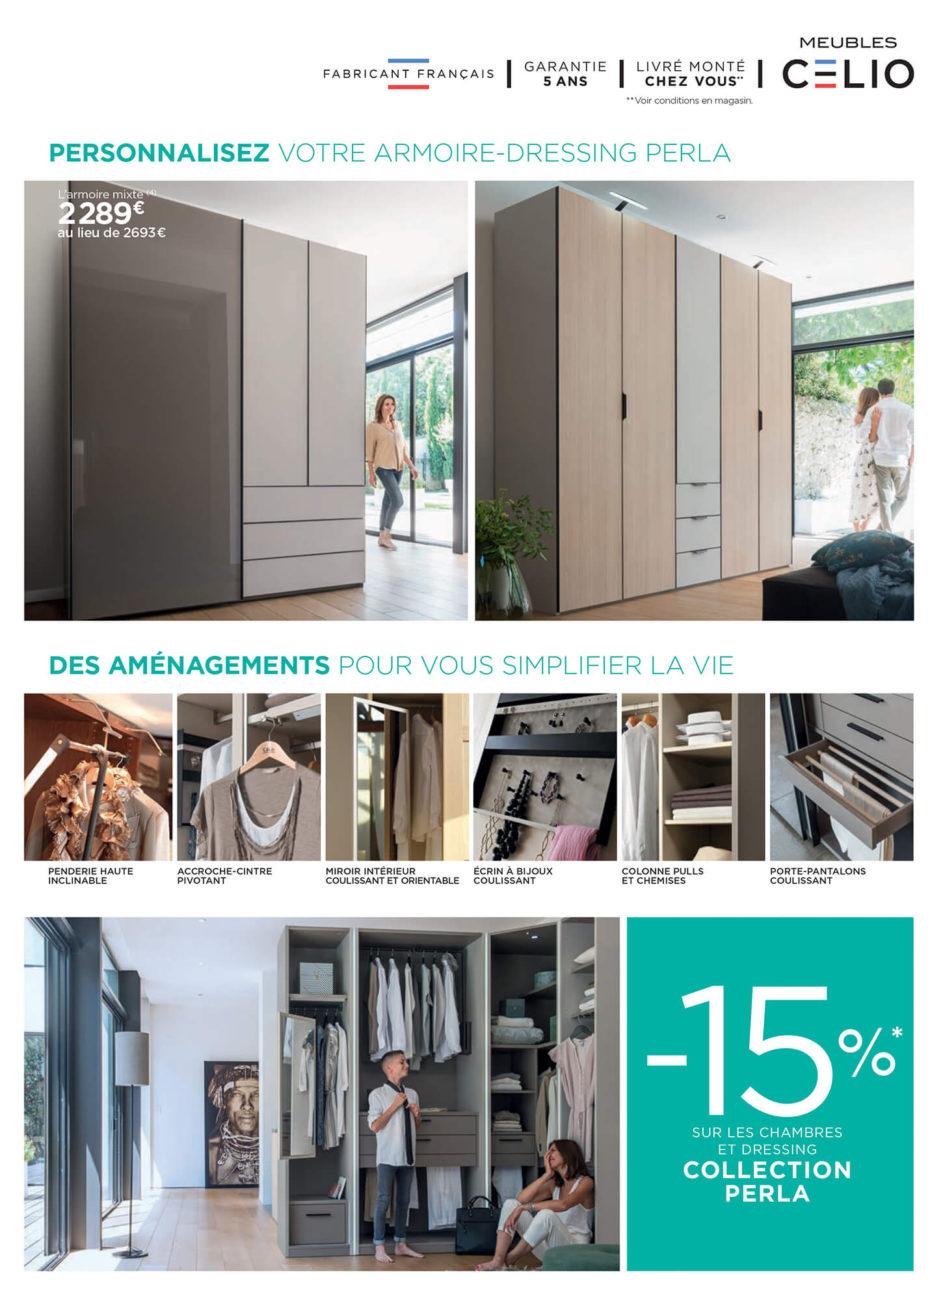 meuble-celio-promotion-mars-2019-vazard-home-p3